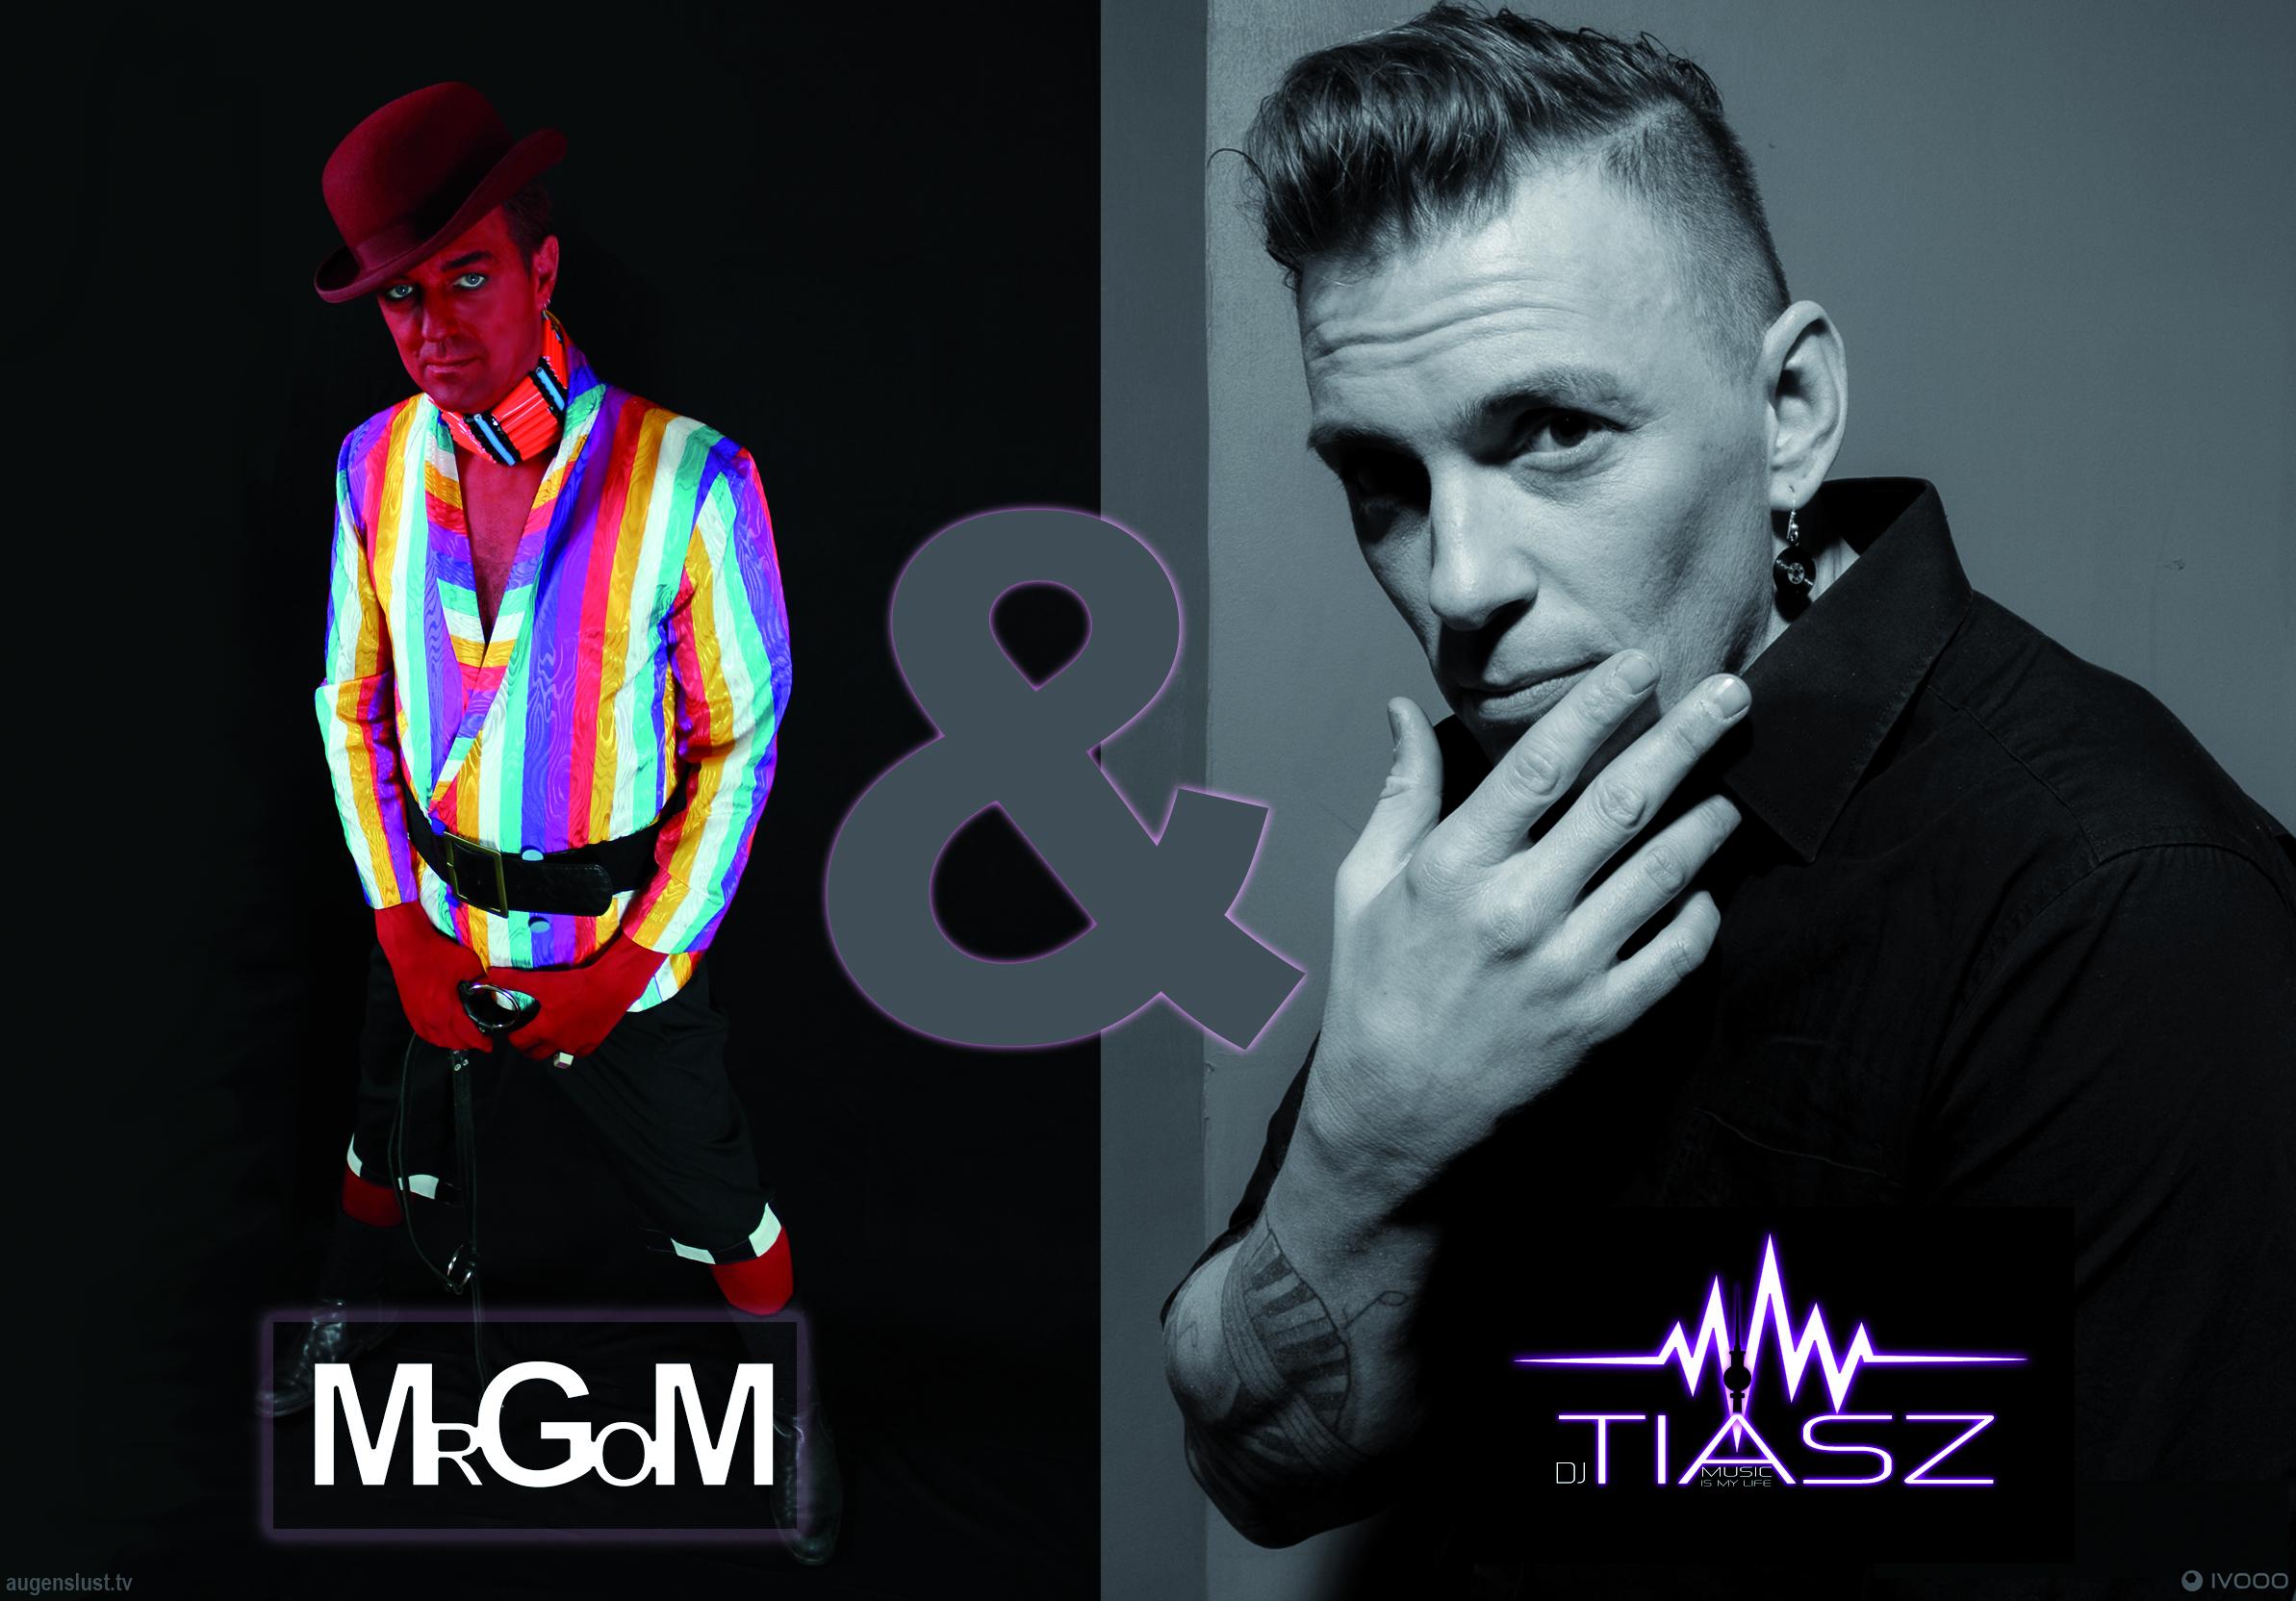 Pressefoto-Tiasz(ivooo)&MrGoM(augenlustTV)-MitLogos